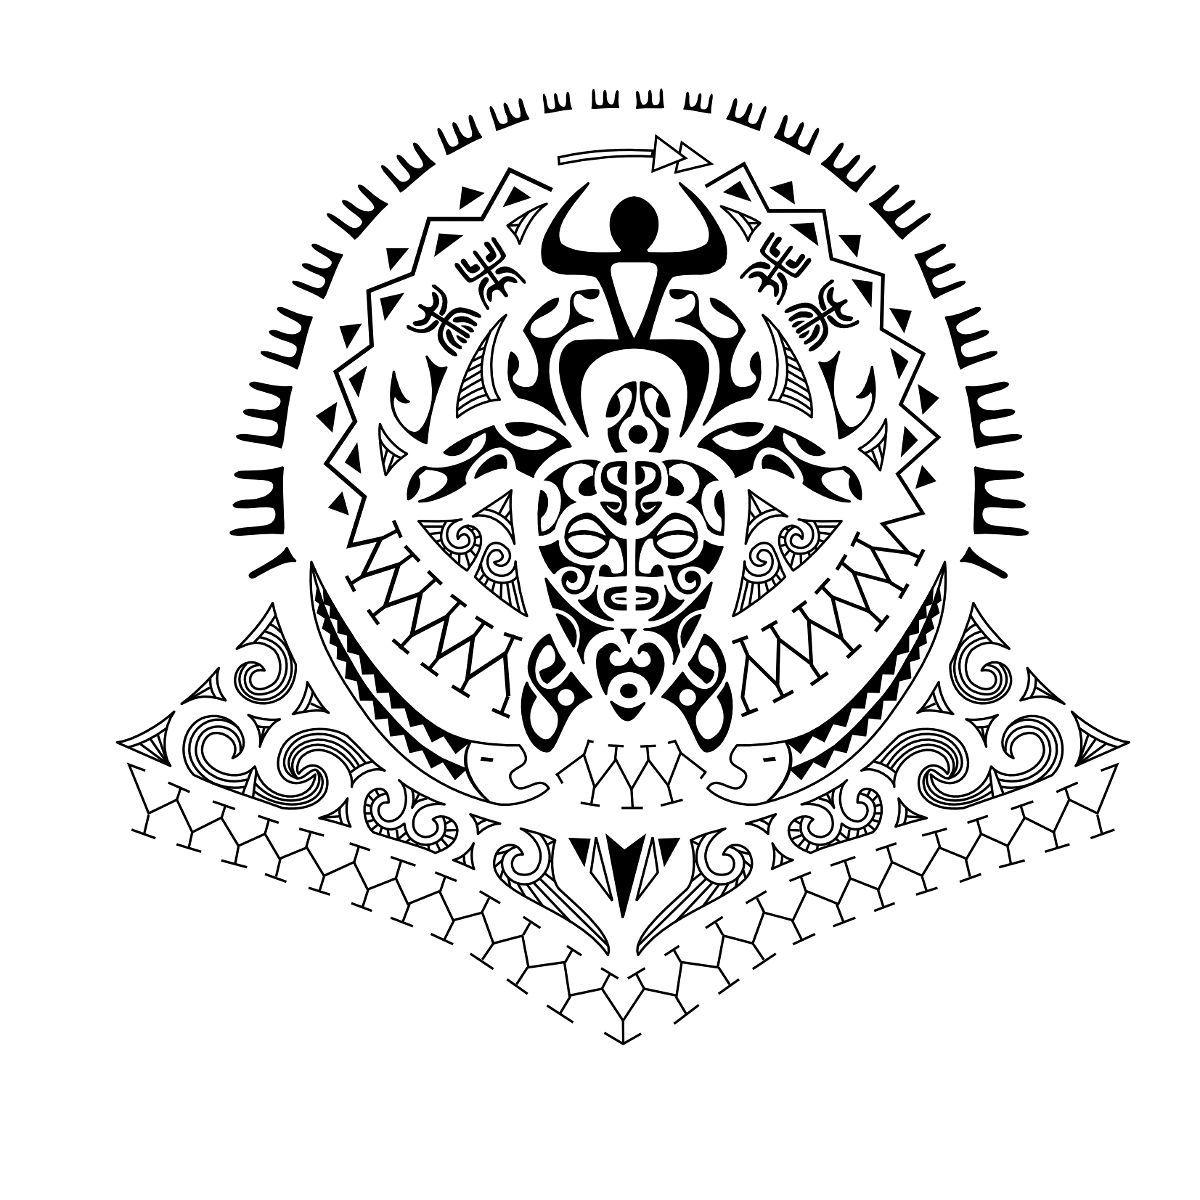 Filipino Tattoos Designs Ideas And Meaning: PZ C: Tatuaggi Maori